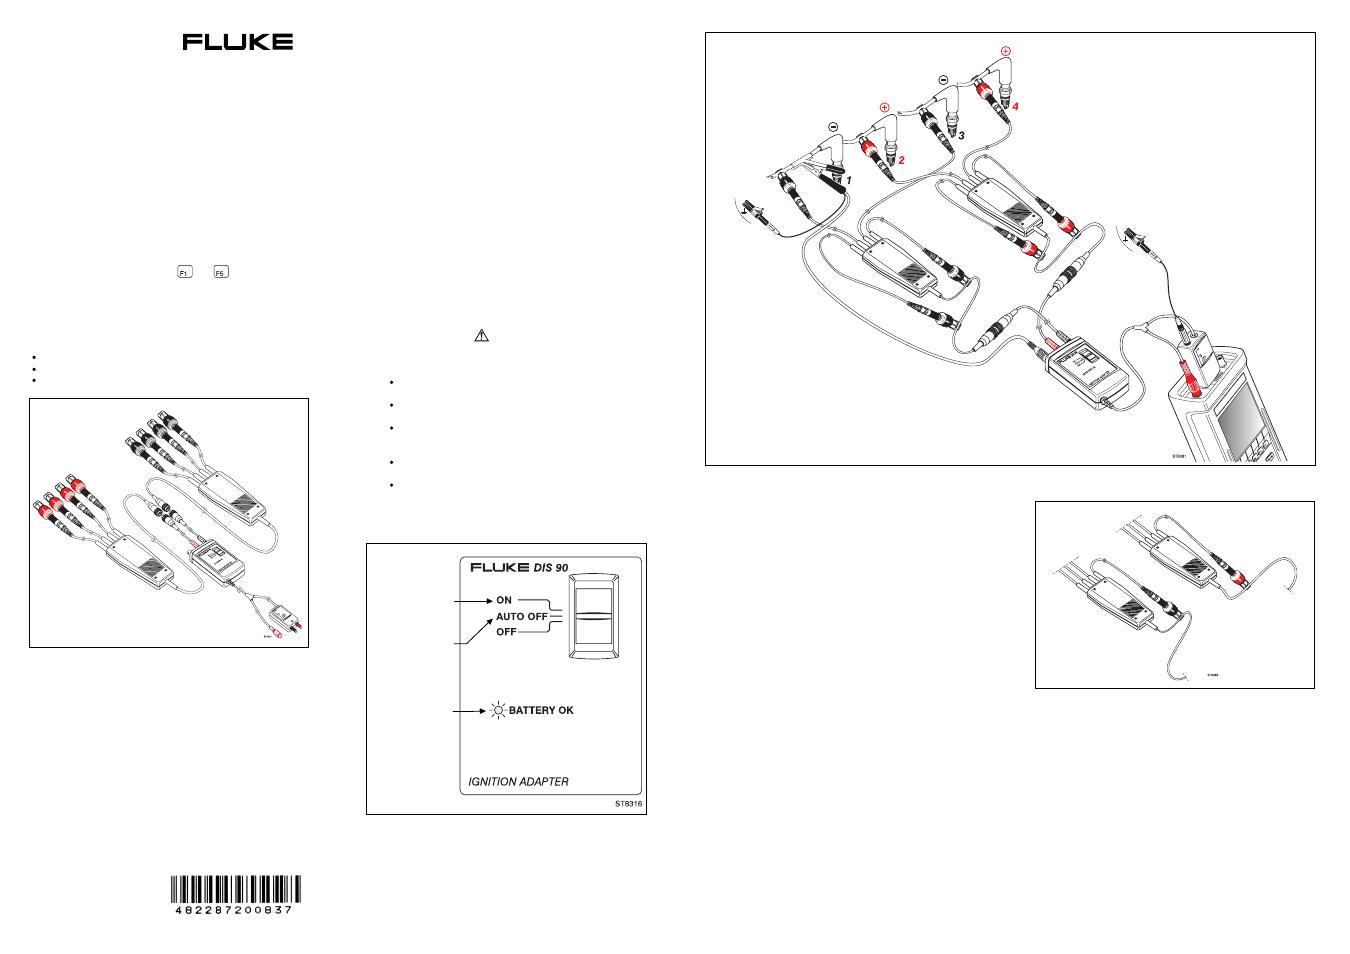 Fluke Dis 90 User Manual